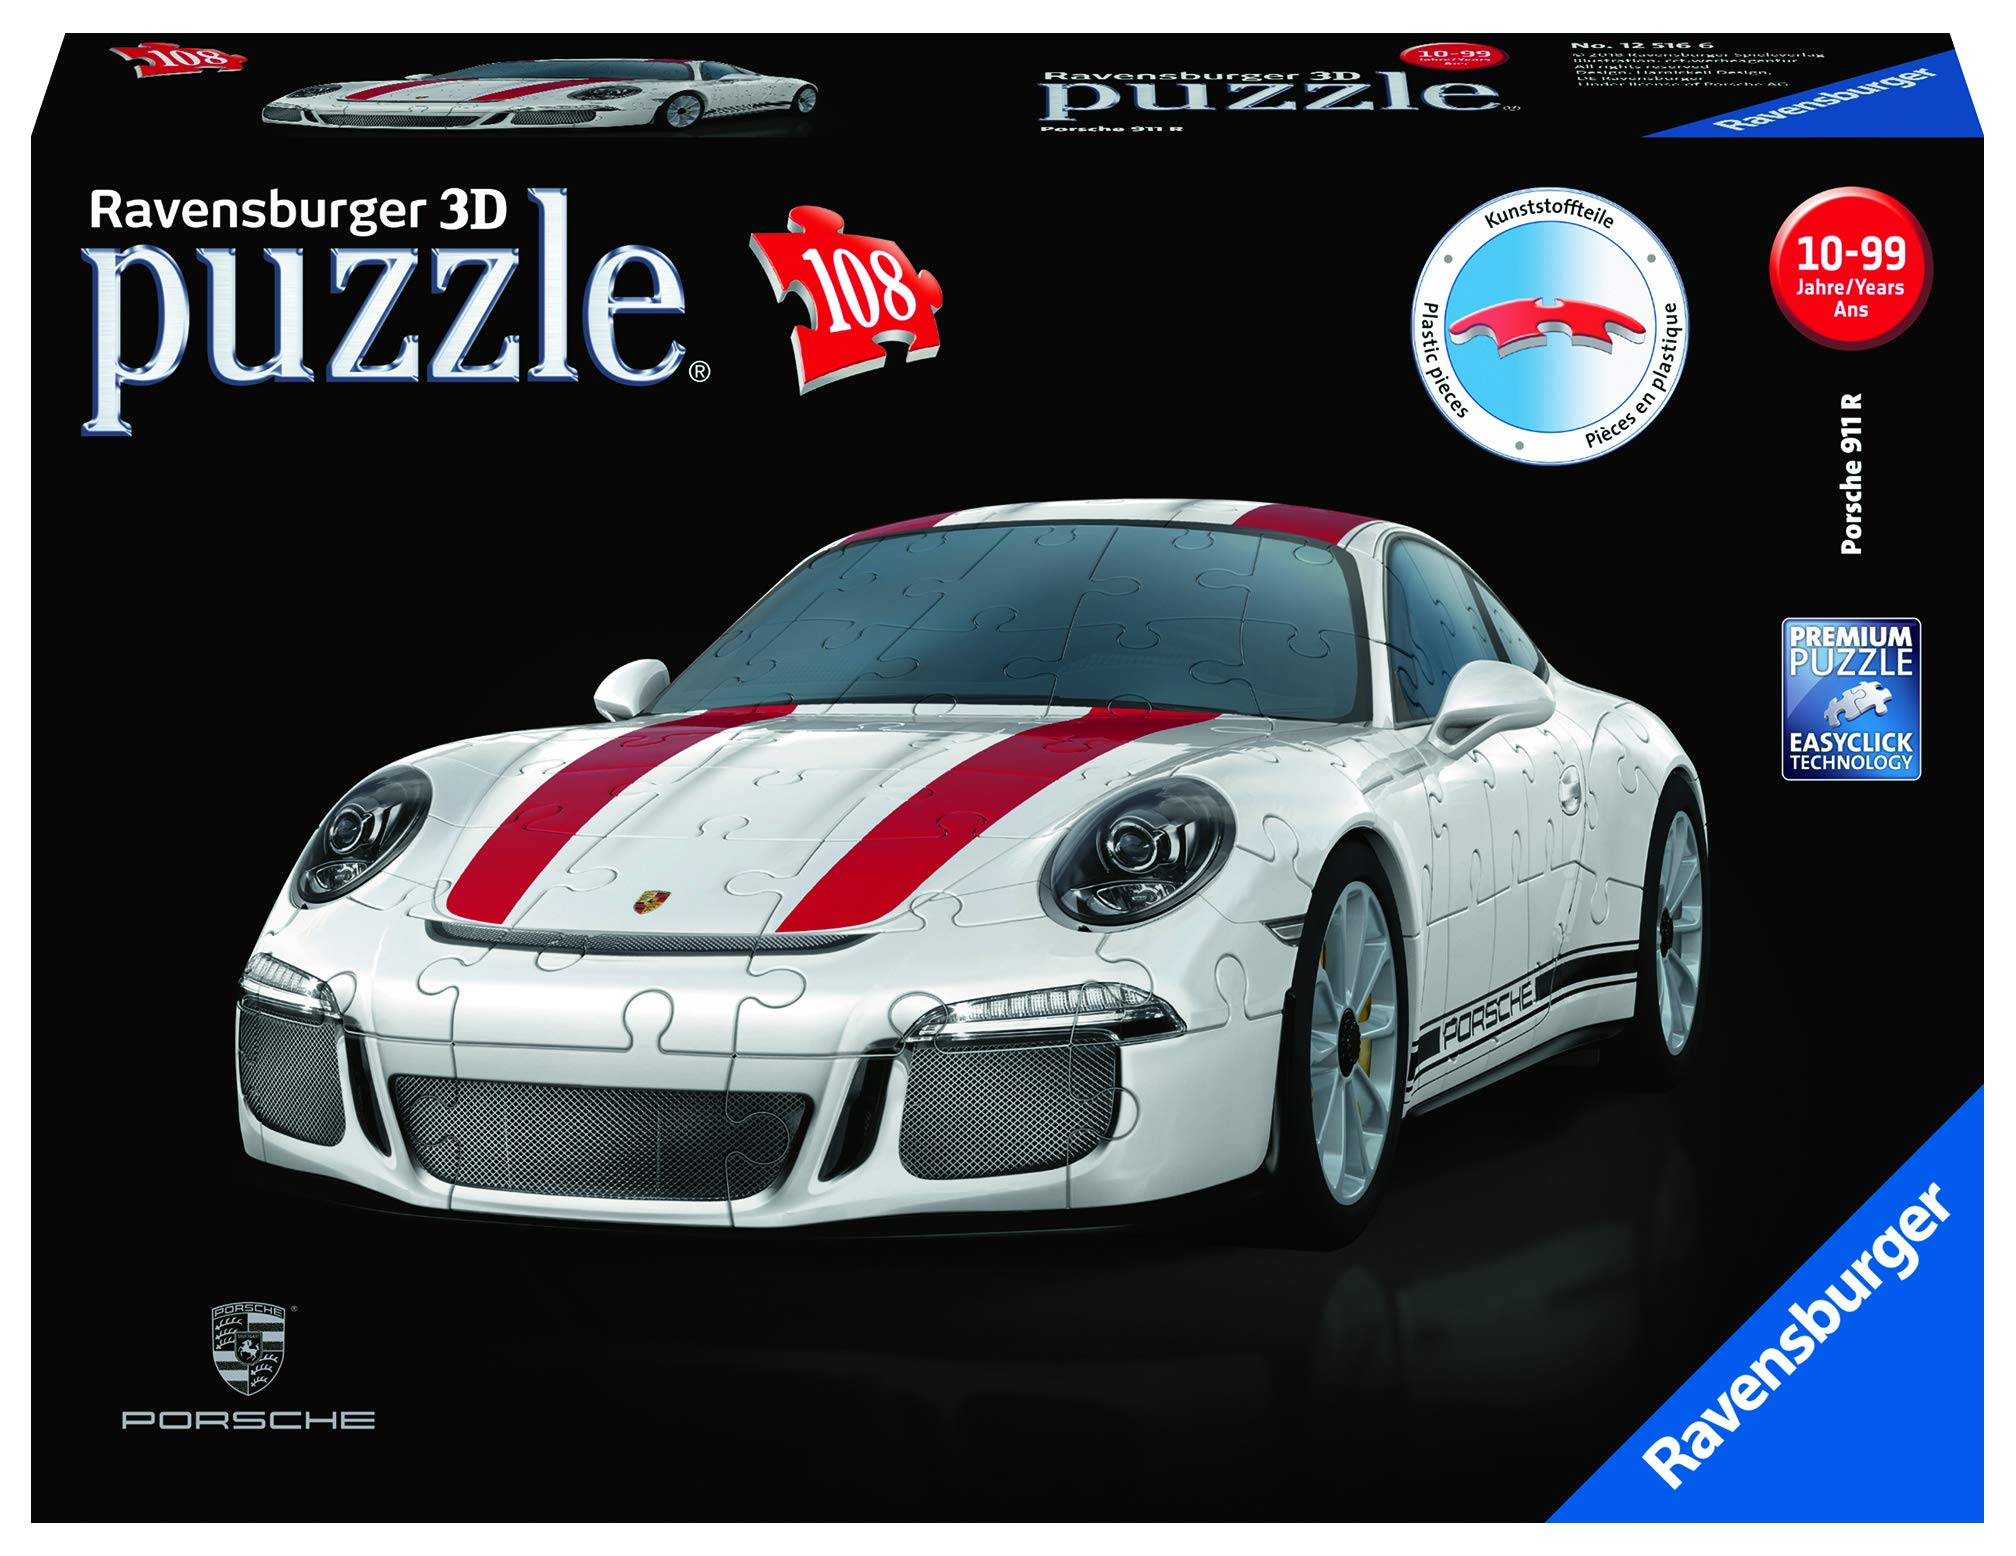 RAVENSBURGER 3D JIGSAW PUZZLE  12535 GRAFFITI SNEAKER 108 PIECES